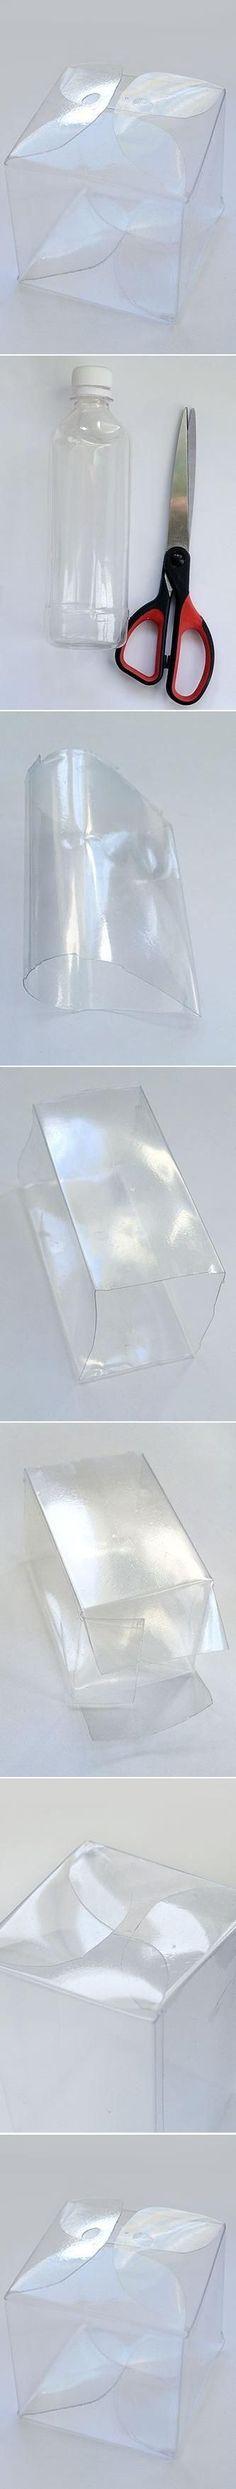 DIY Plastic Bottle Box | DIY Creative Ideas